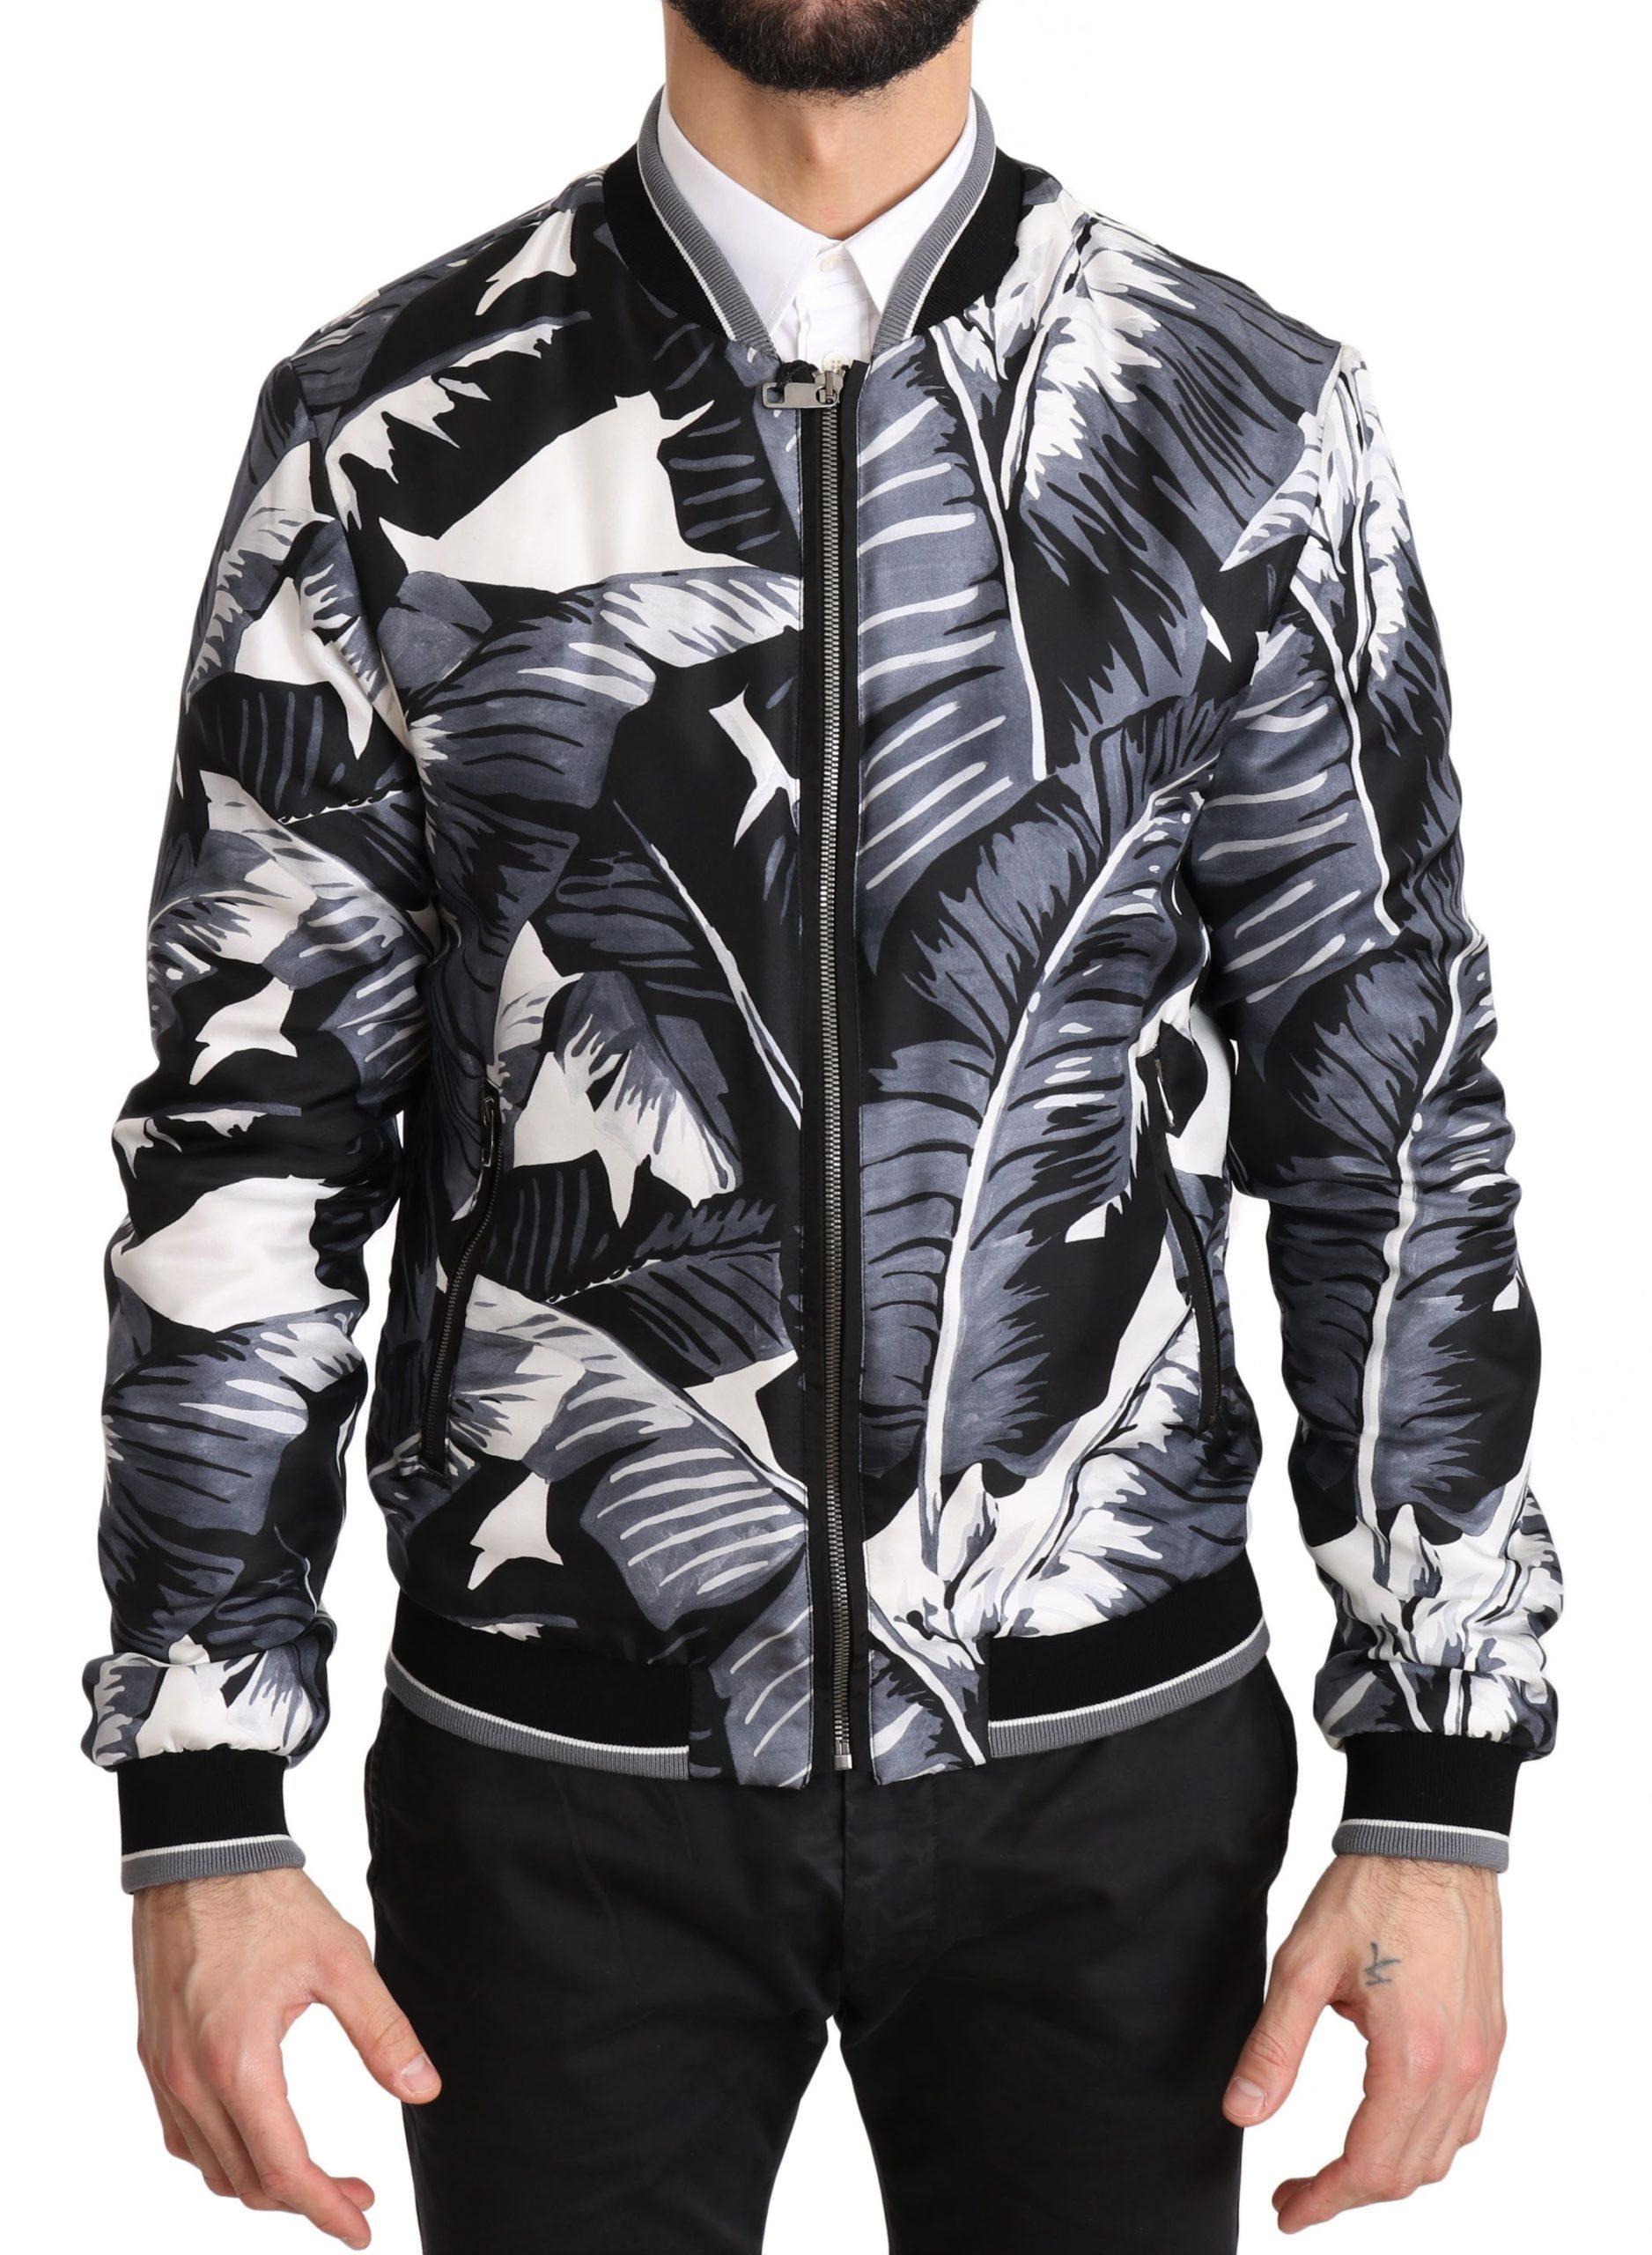 Dolce & Gabbana Men's Silk Banana Leaf Print Bomber Jacket Black JKT2356 - IT44 | XS